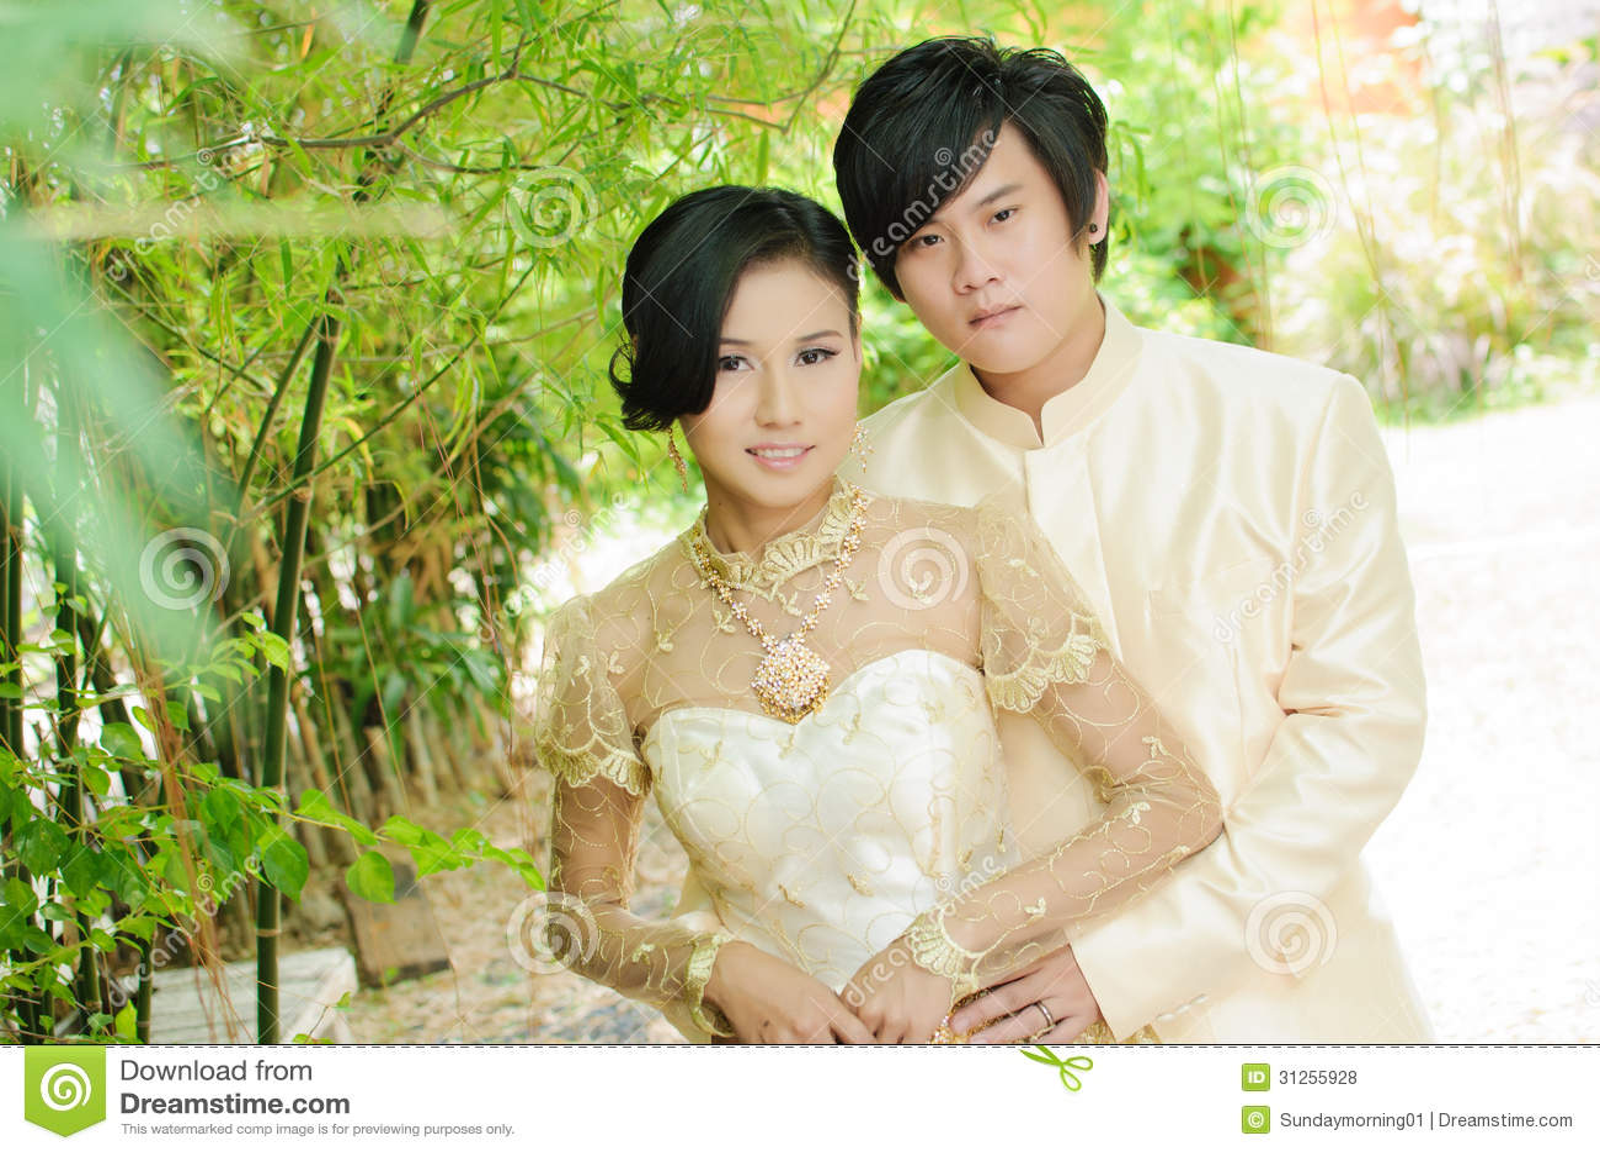 Traditional wedding dress thailand royalty free stock photos